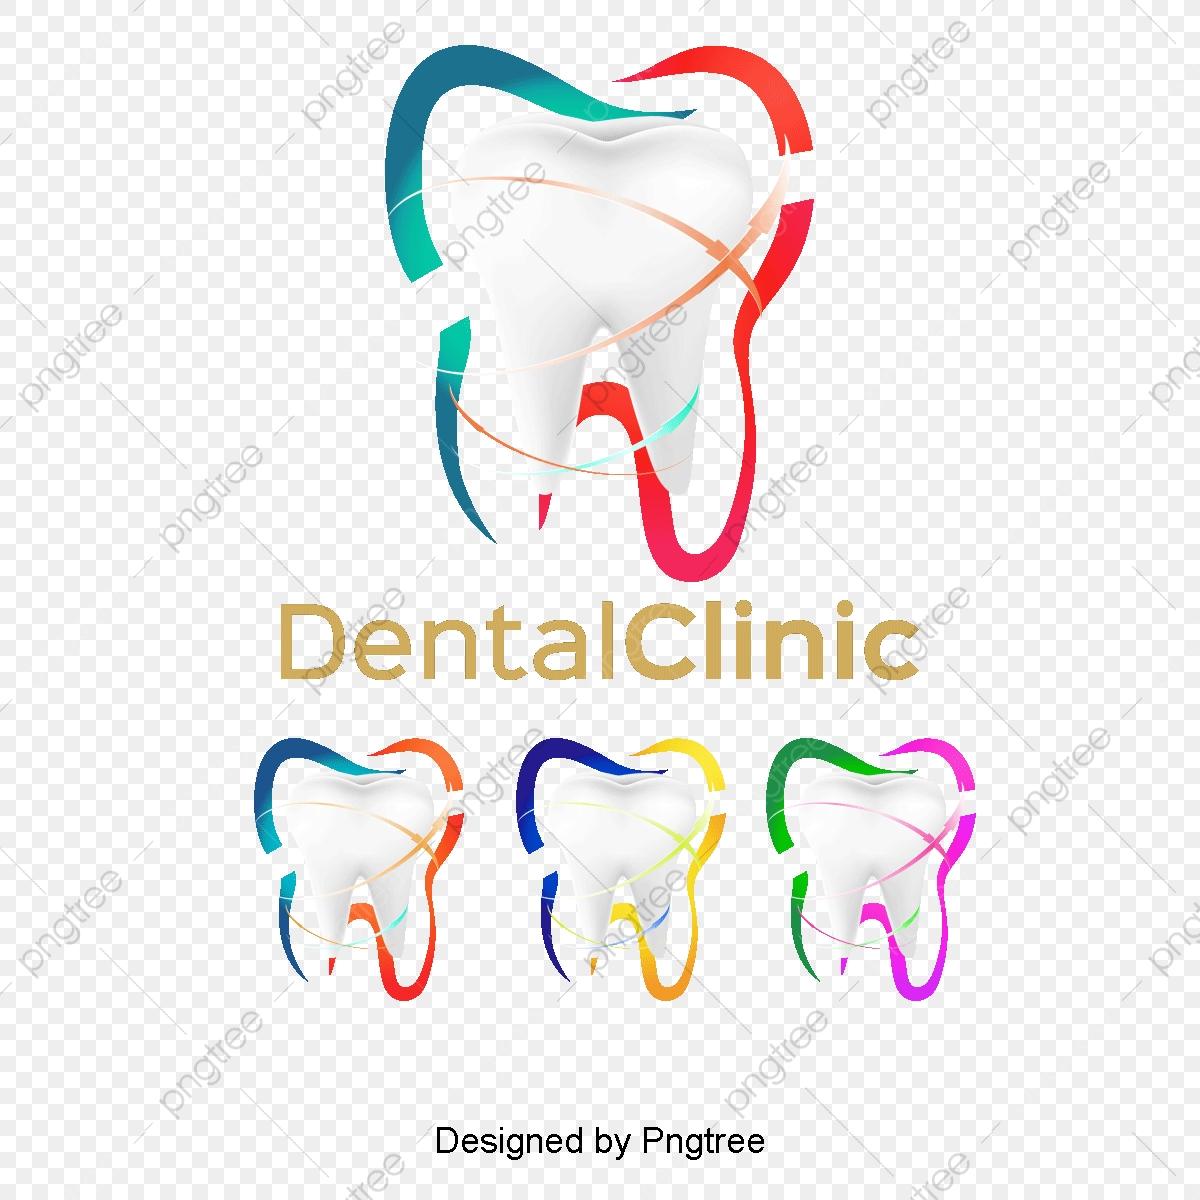 Dental Clinic Logo, Health Care, Dental Health, Dentist PNG.